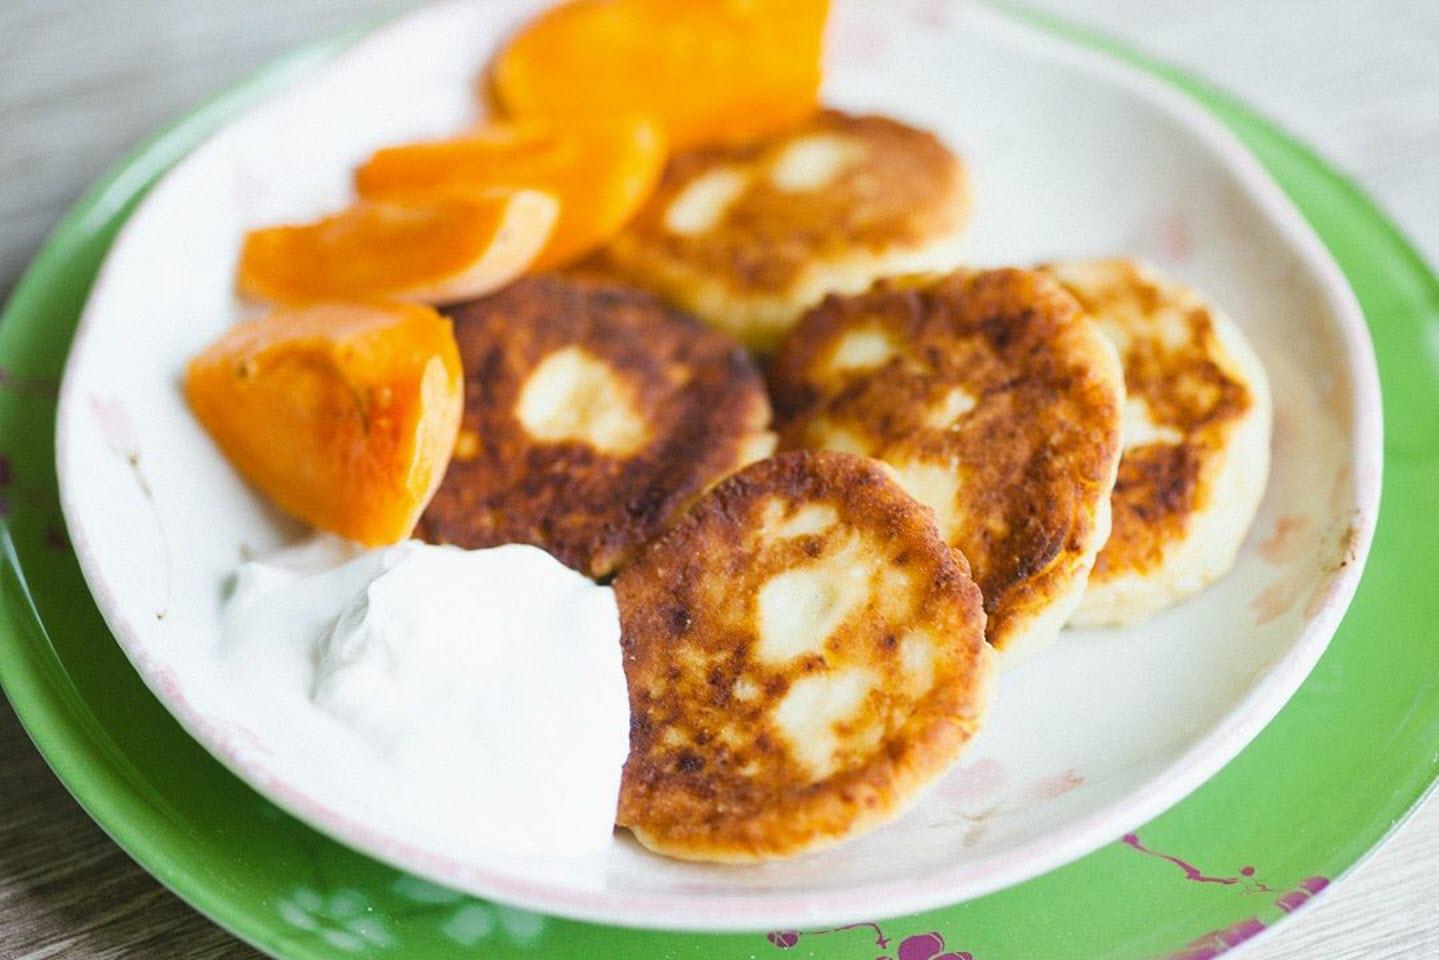 Russian Cheese Pancakes (Syrniki)